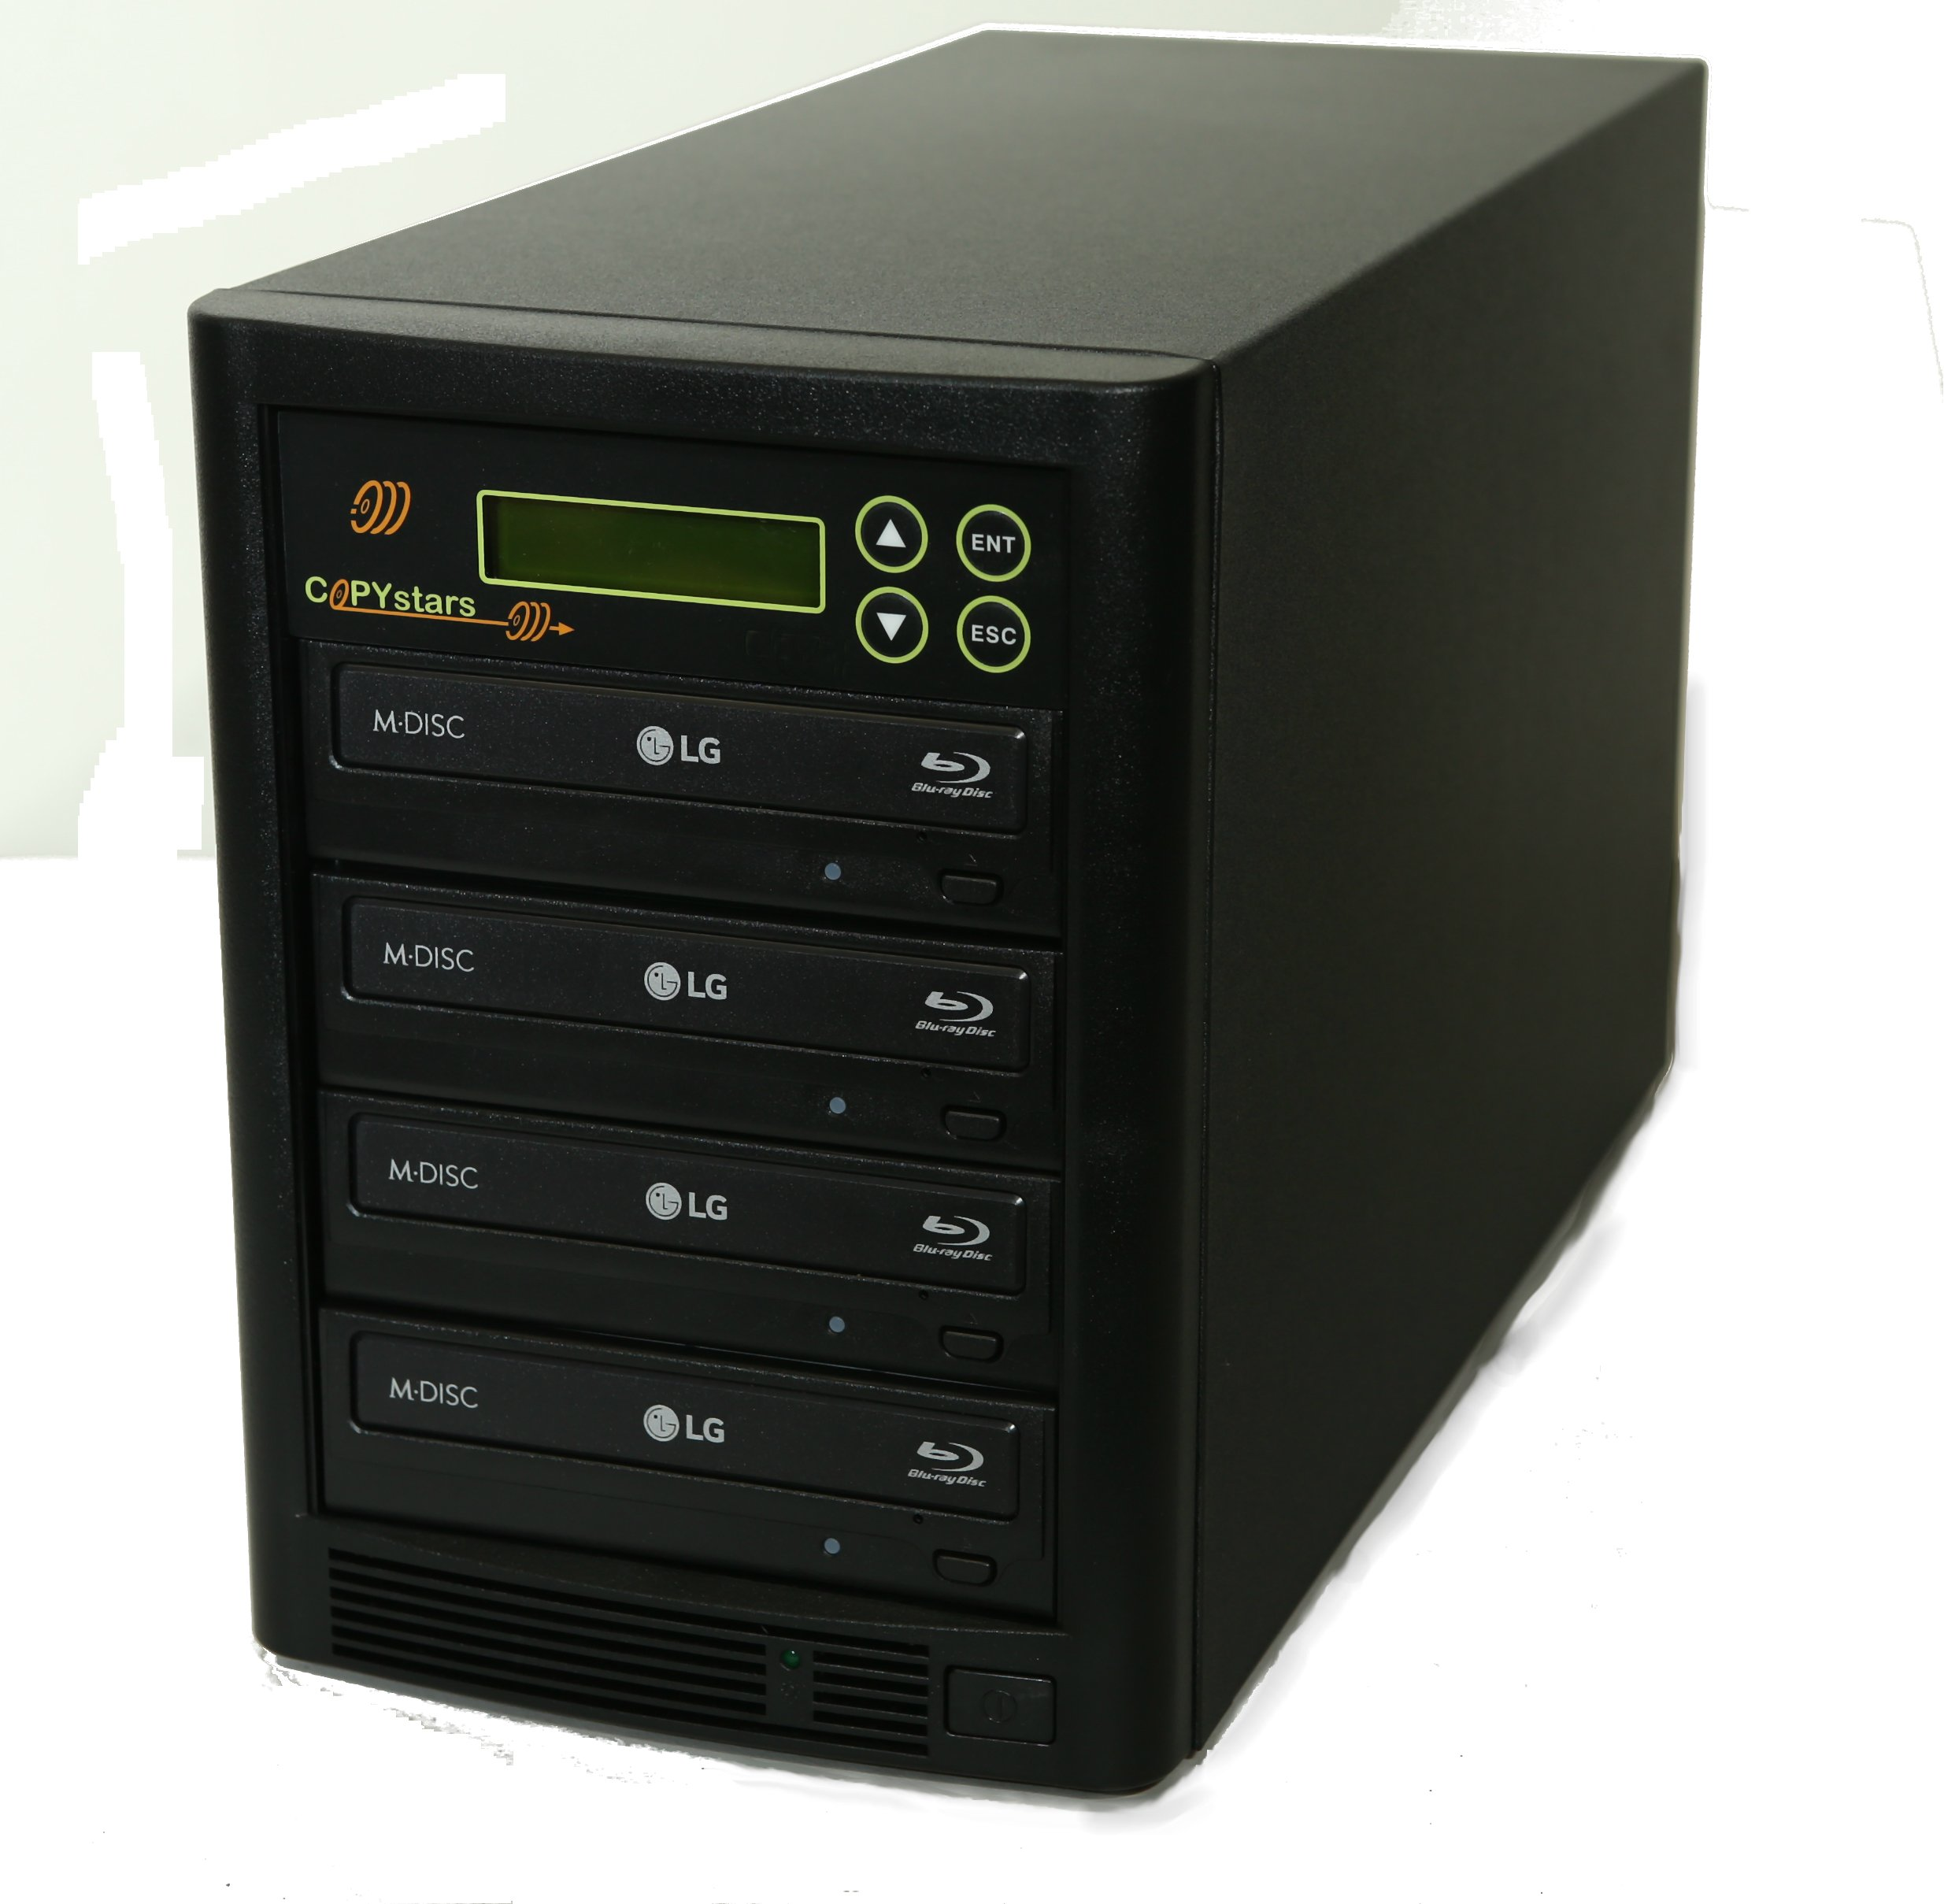 Copystars Blu-Ray-dvd-duplicator-tower USB to ISO 1 TB hard drive 4 BDXL burner-drive CD DVD copier